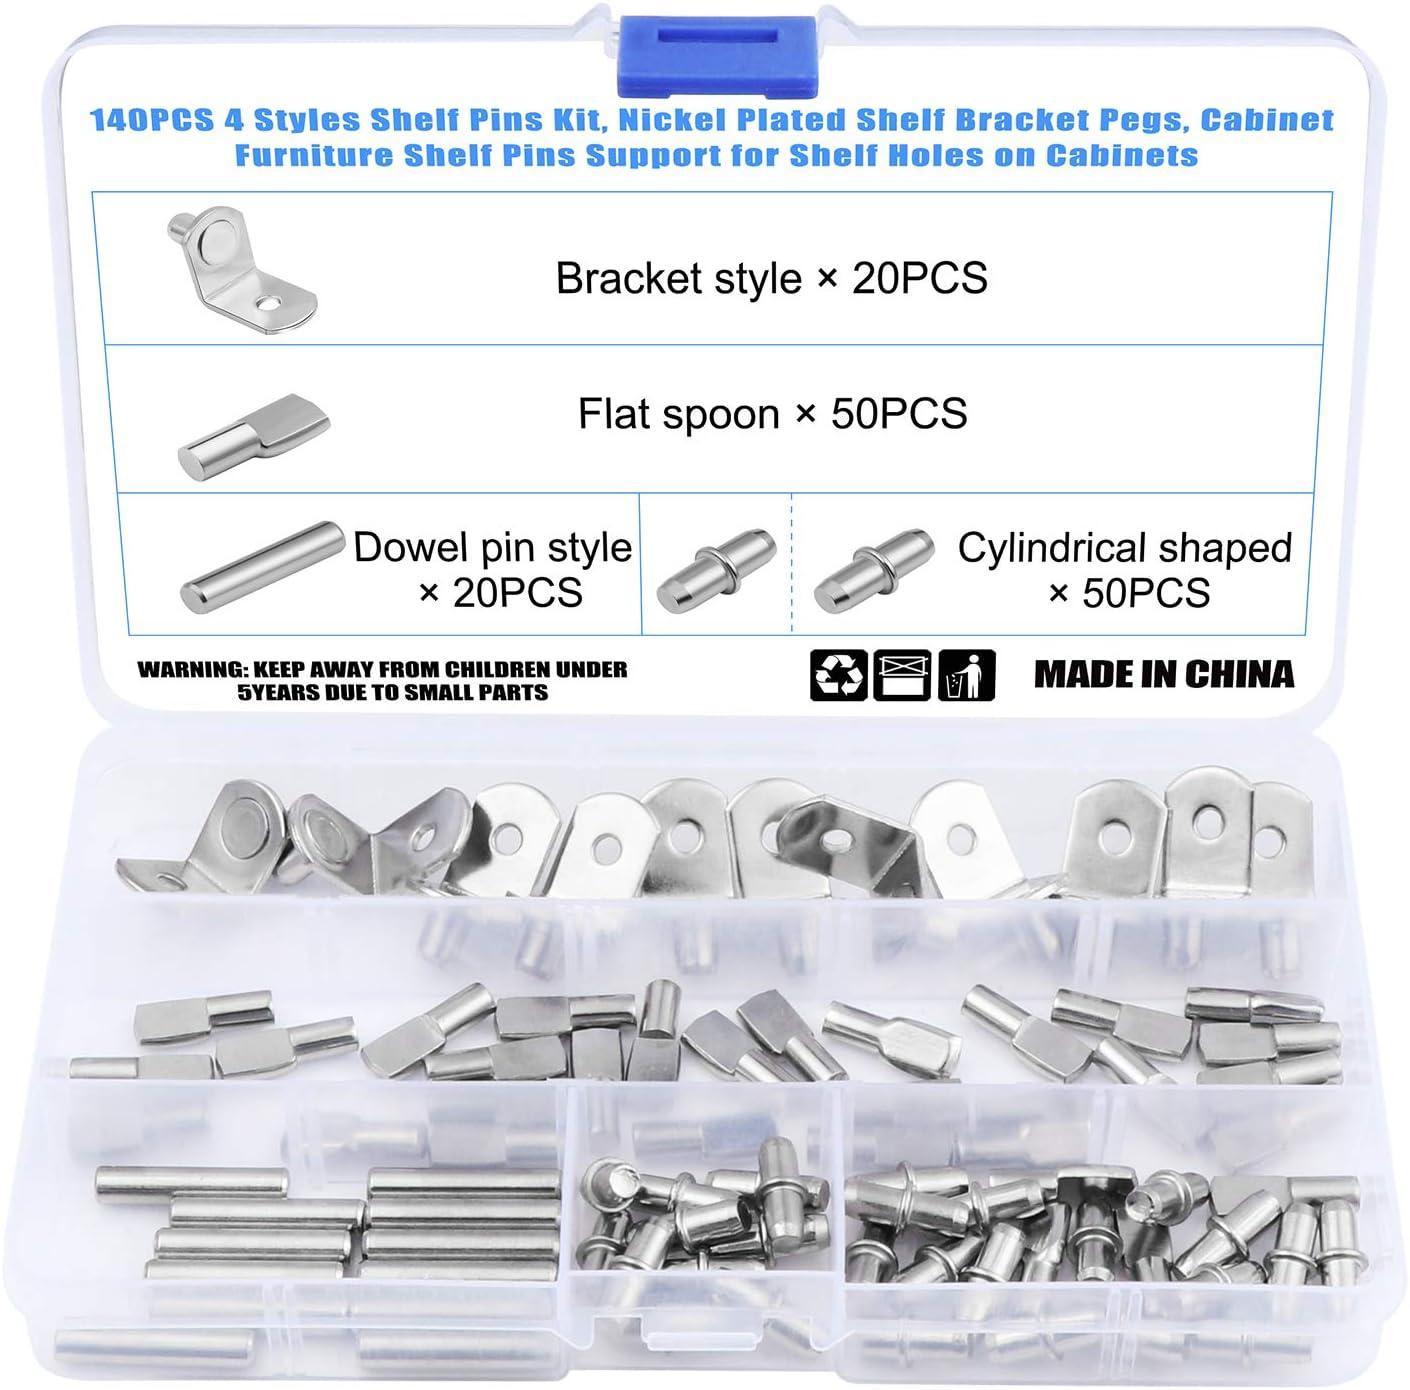 OCR 140PCS 4 Styles Shelf Pins Kit Nickel Plated Shelf Bracket Pegs Shelf Pins Support for Shelf Holes on Cabinet Furniture